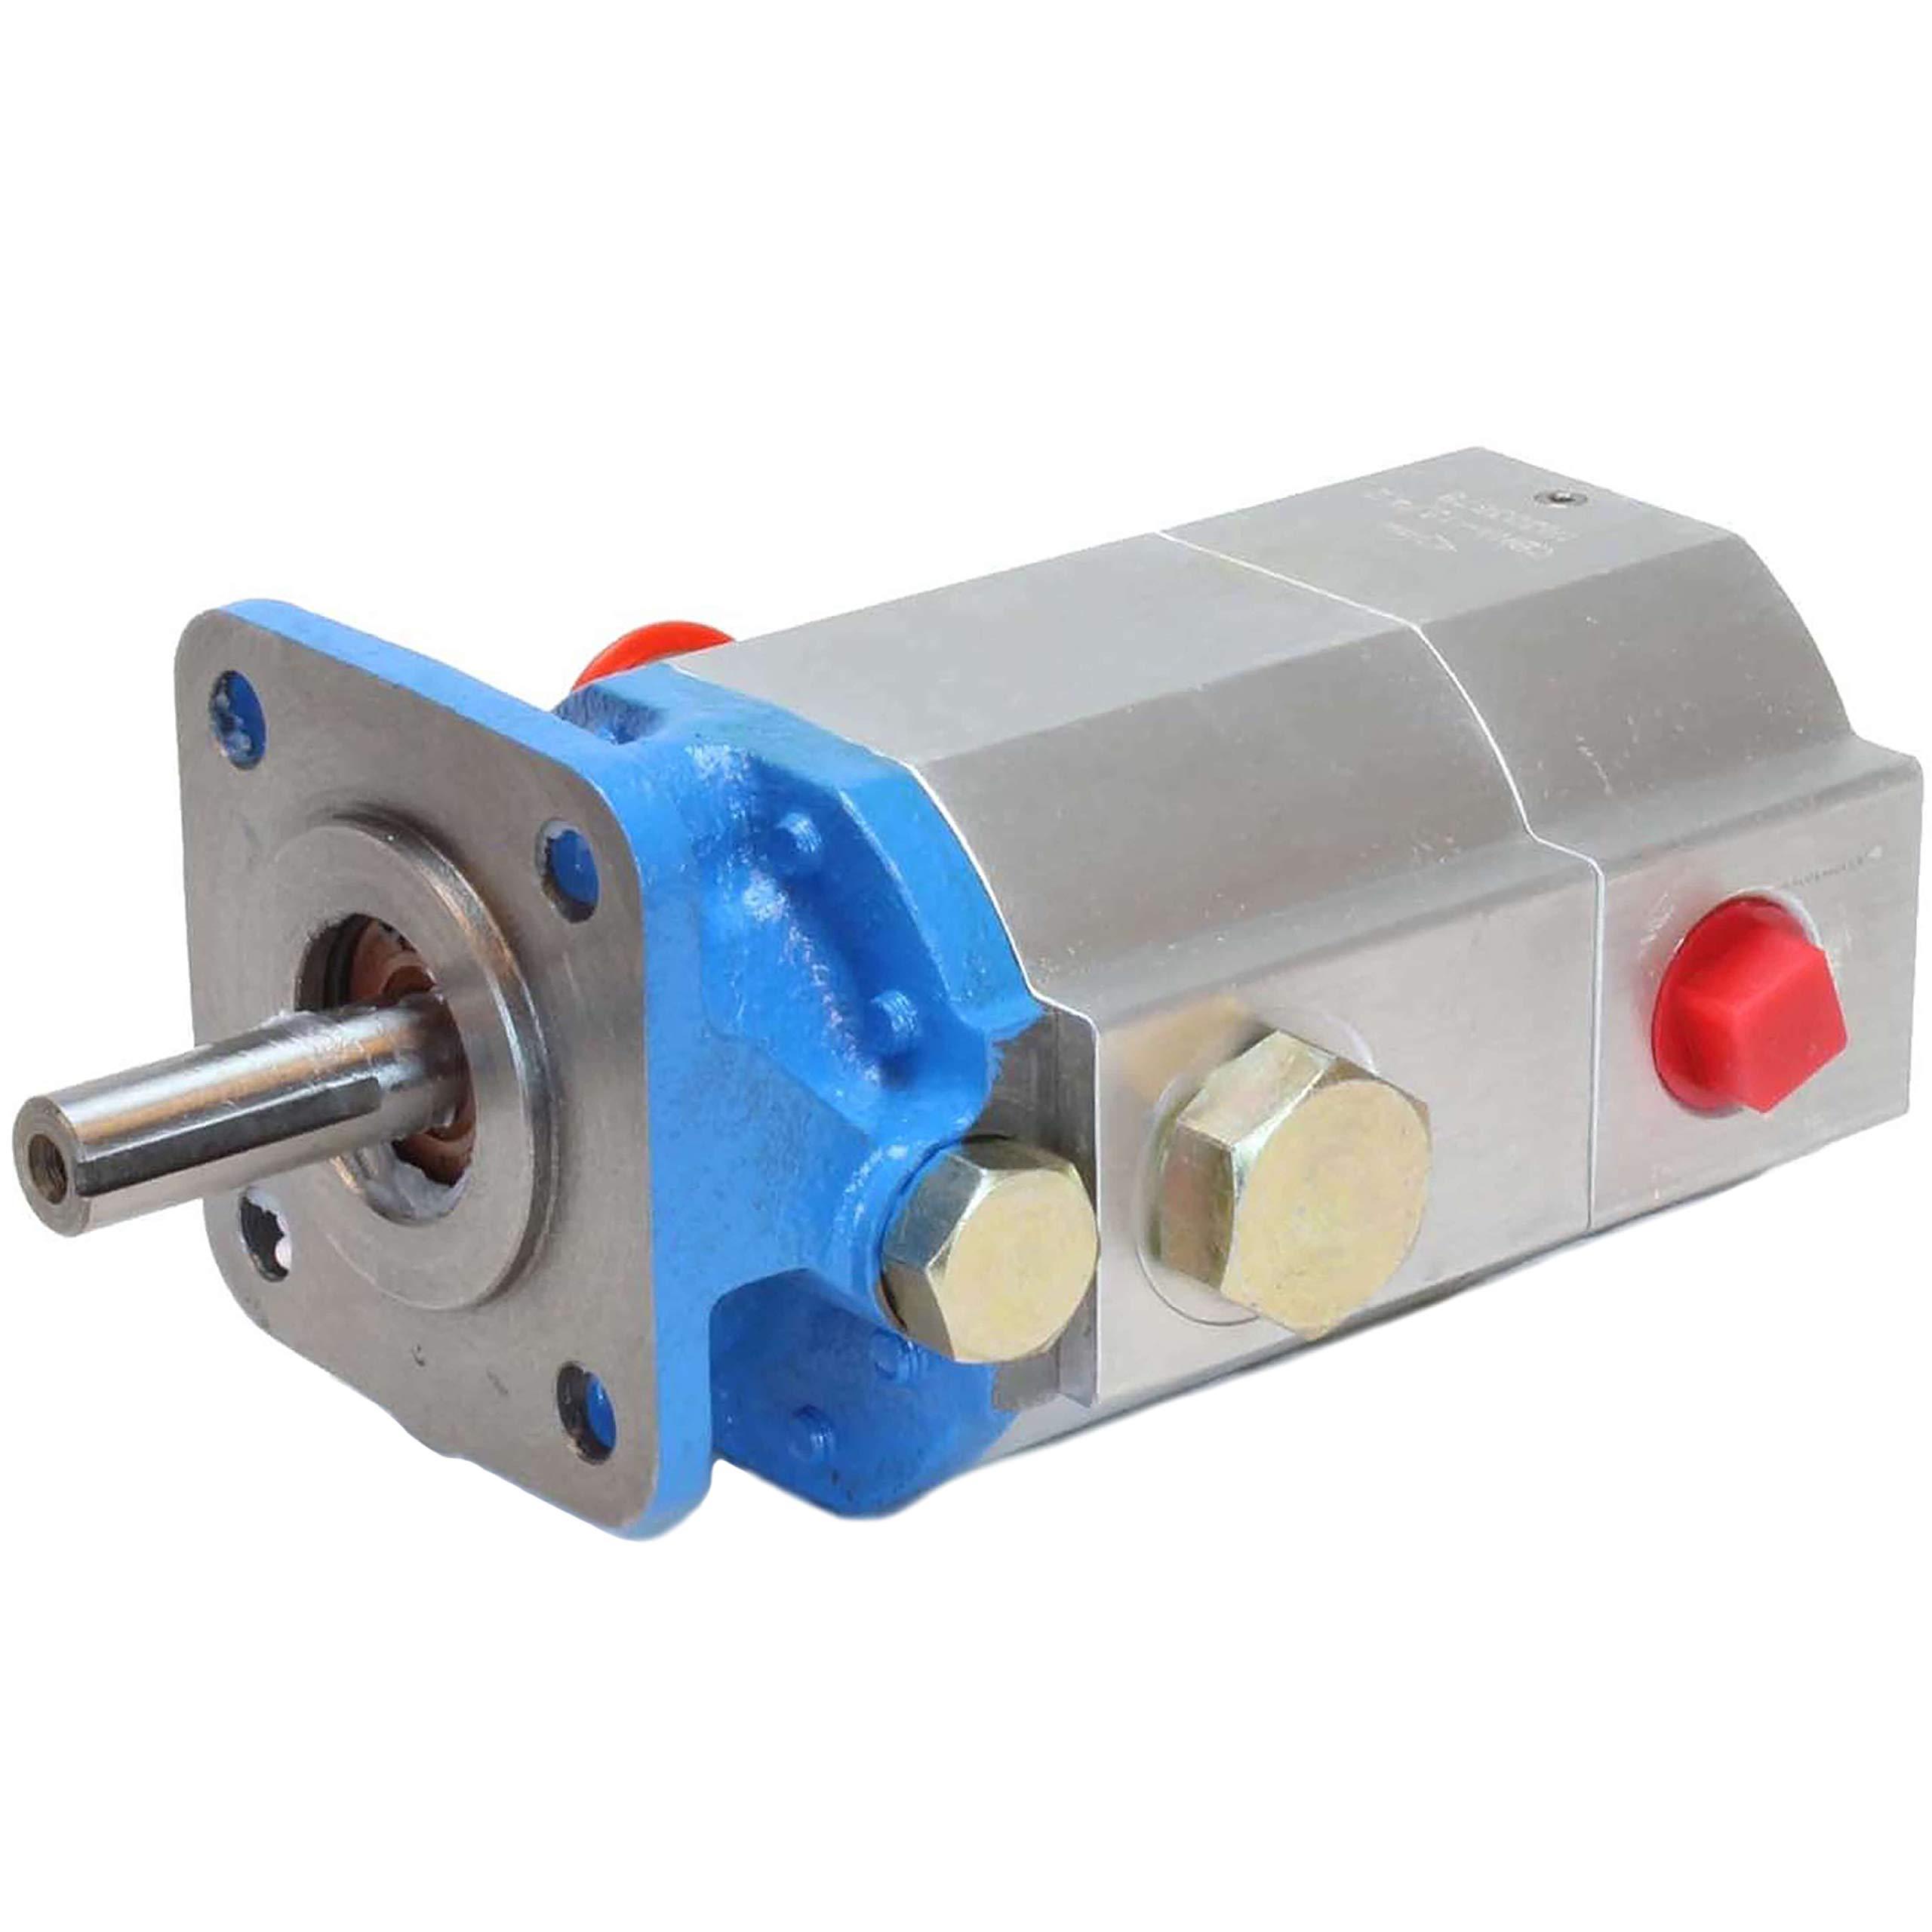 RuggedMade 16 GPM 2 Stage Hydraulic Log Splitter Pump, 3000 PSI by RuggedMade